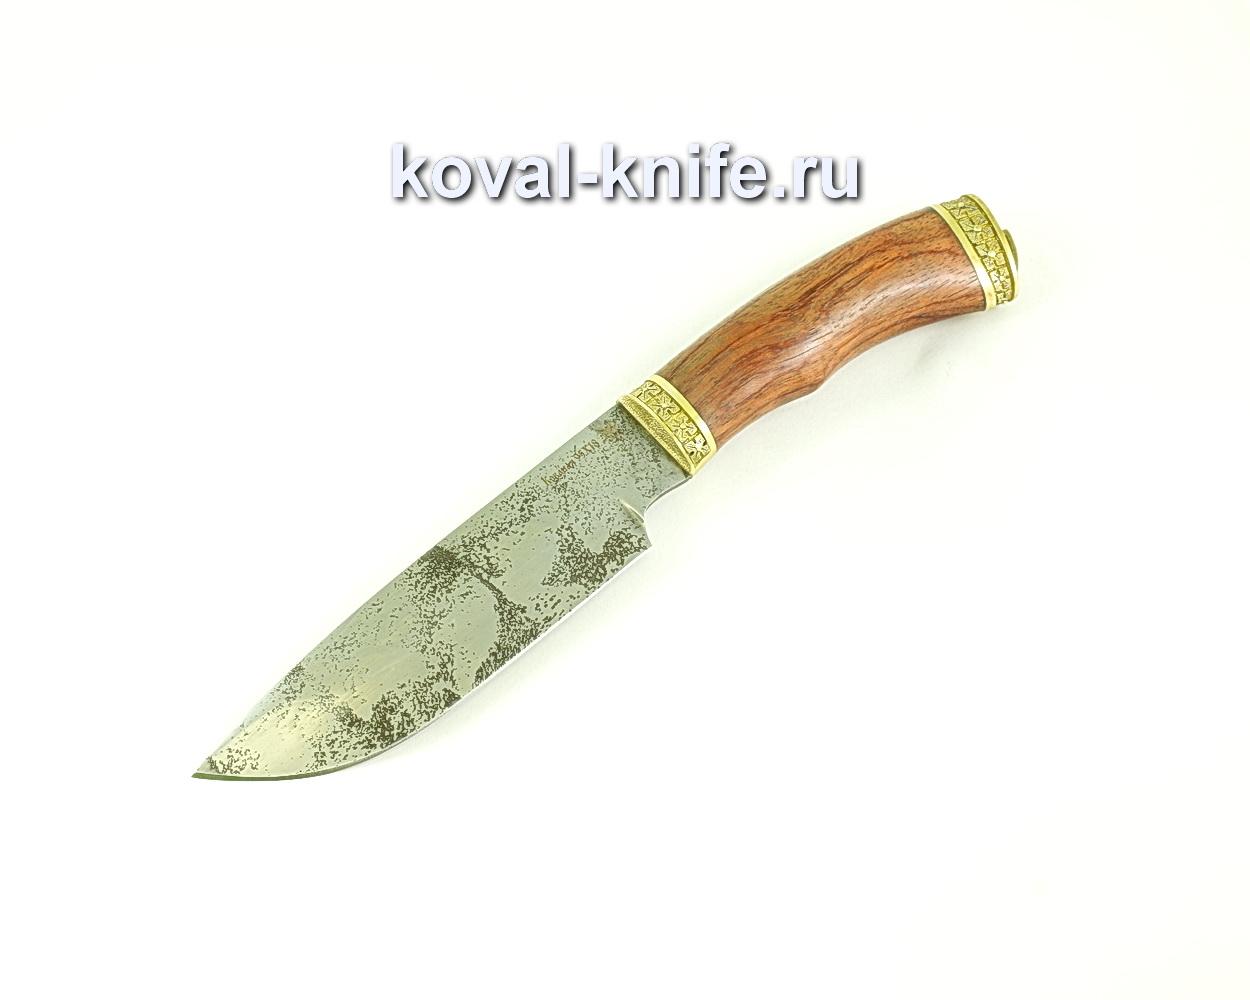 Нож Бигзод (сталь 95х18), рукоять бубинга, литье A277